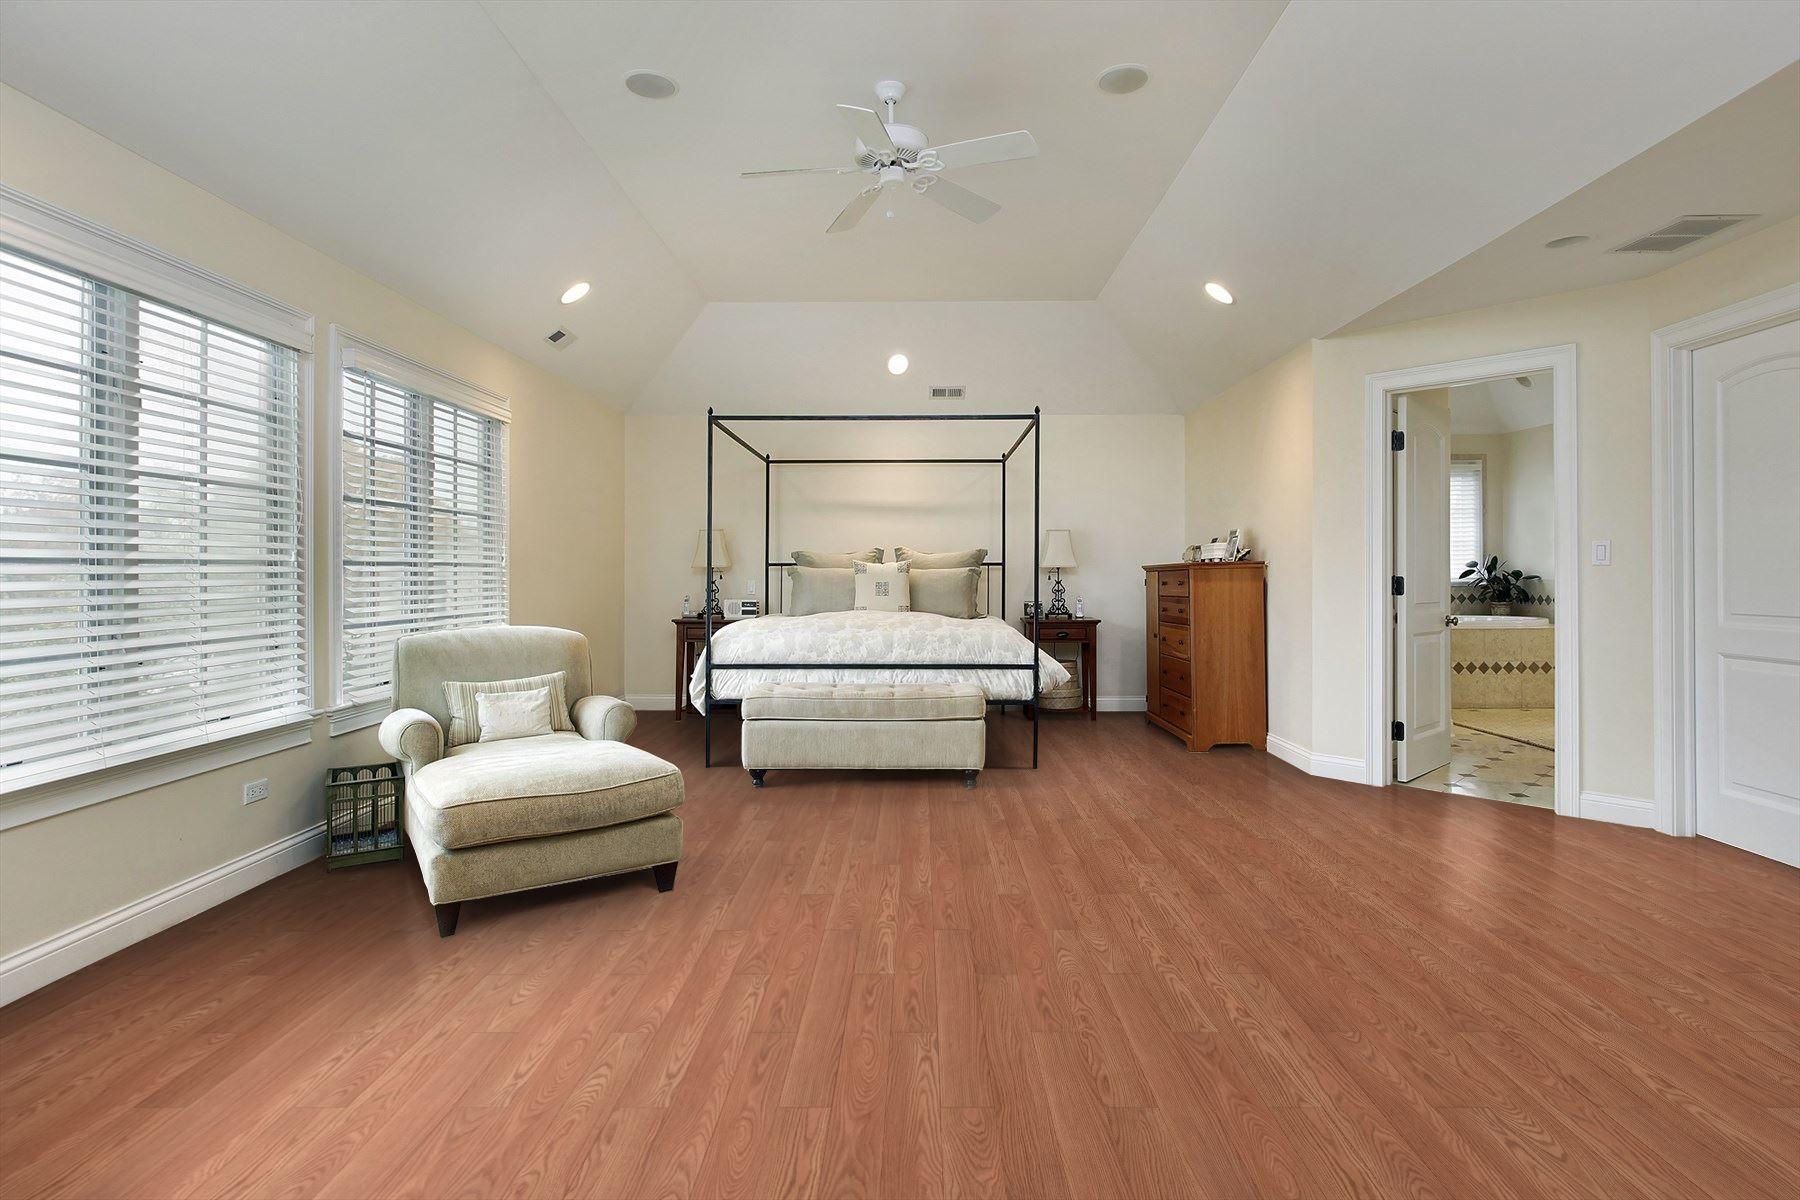 Blanched French Oak Laminate Flooring Oak Laminate Bedroom Flooring White Bedroom Design